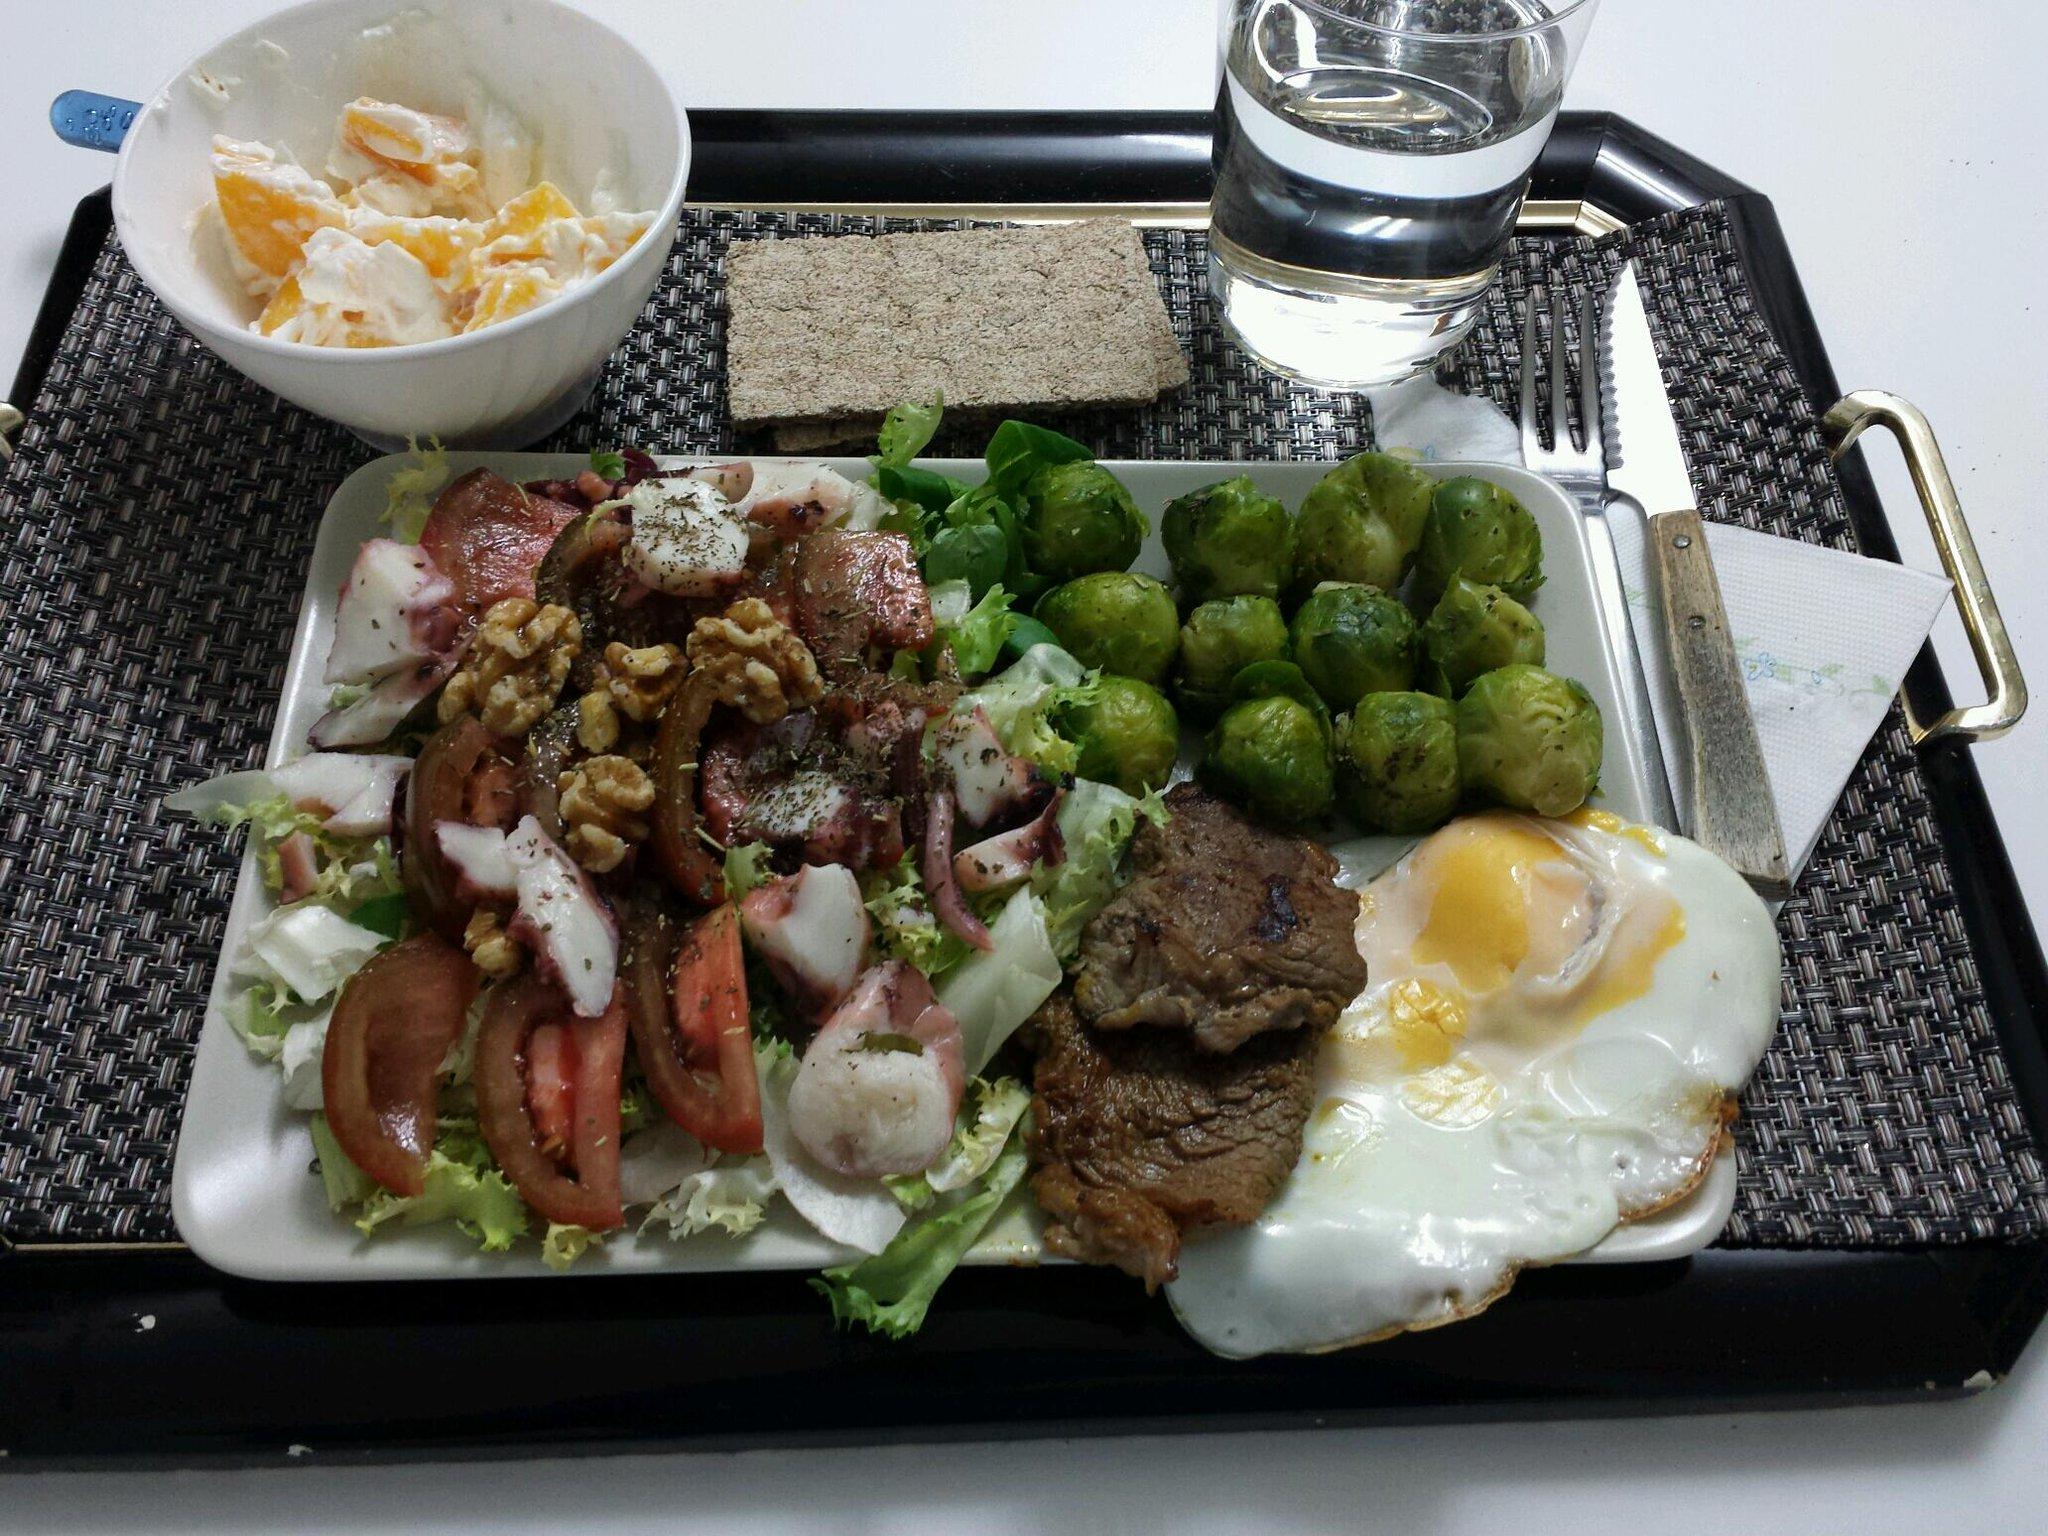 Qué aproveche :)  Ternera, huevo, coles, mix de verde, tomate, nueces, melocotón, queso quark, wasa... :) http://t.co/JxHFH6A4Ag